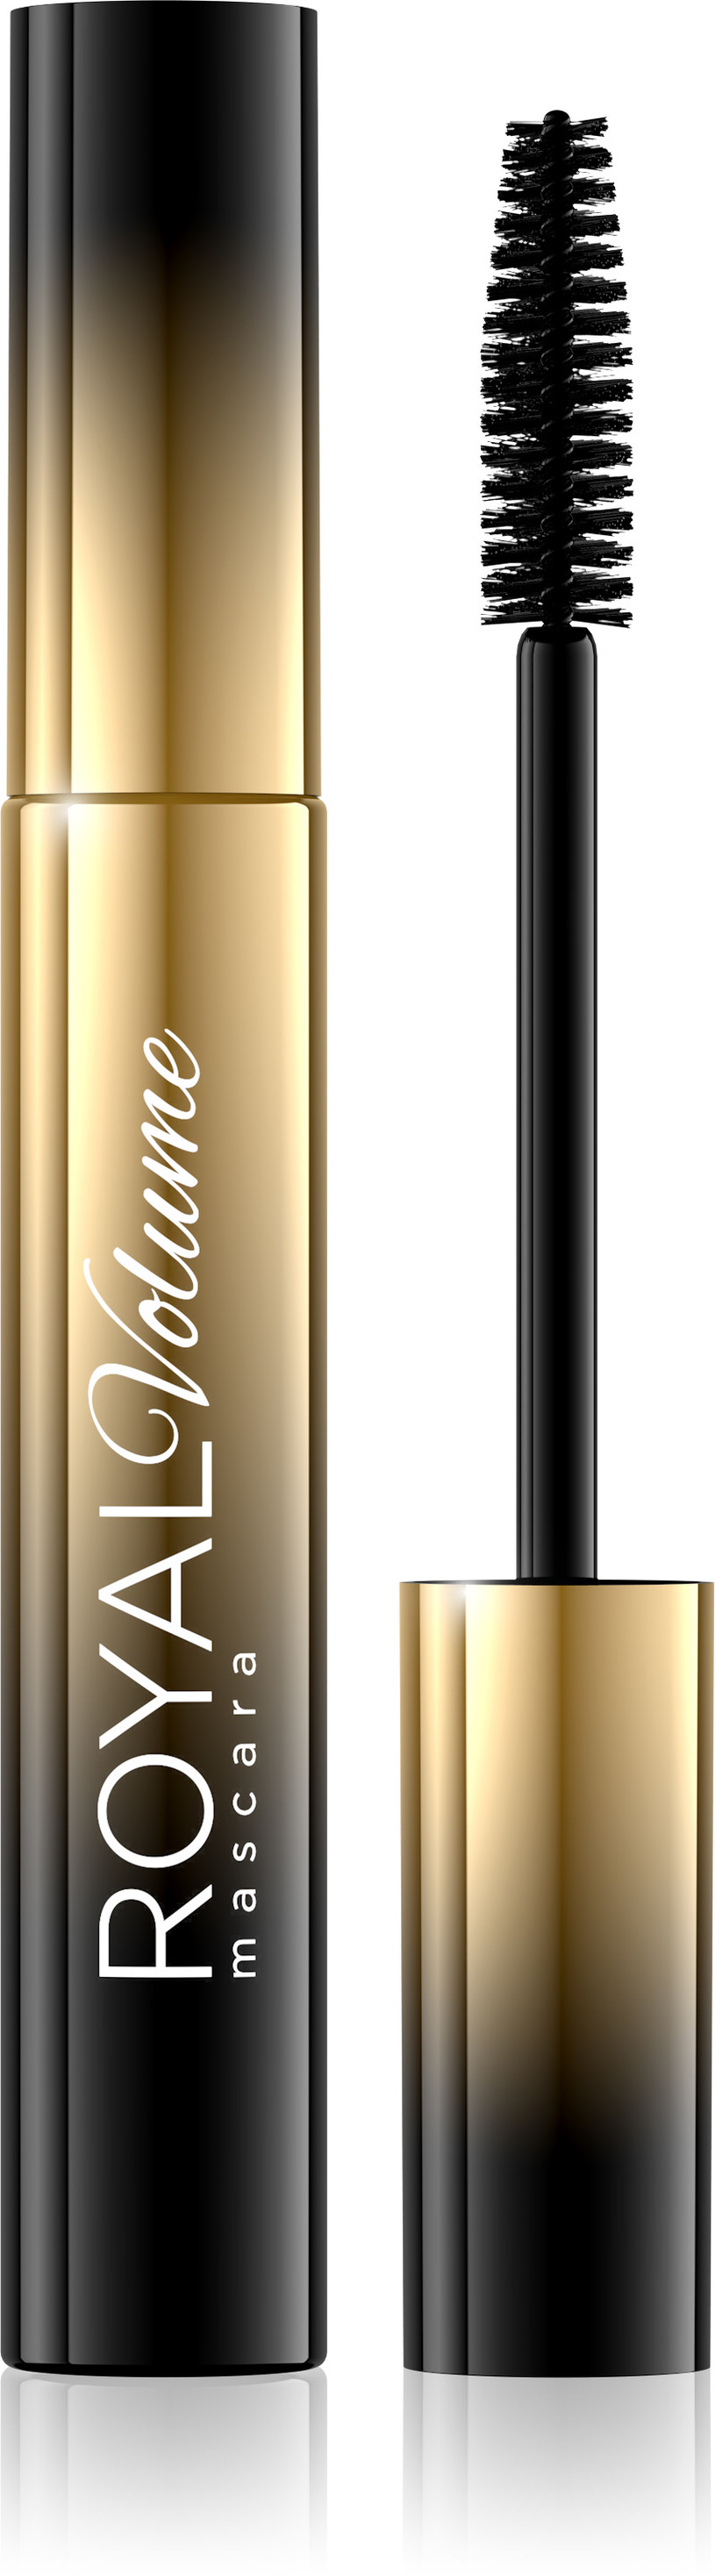 Maskara Royal Volume od Eveline Cosmetics /INTERIA.PL/materiały prasowe